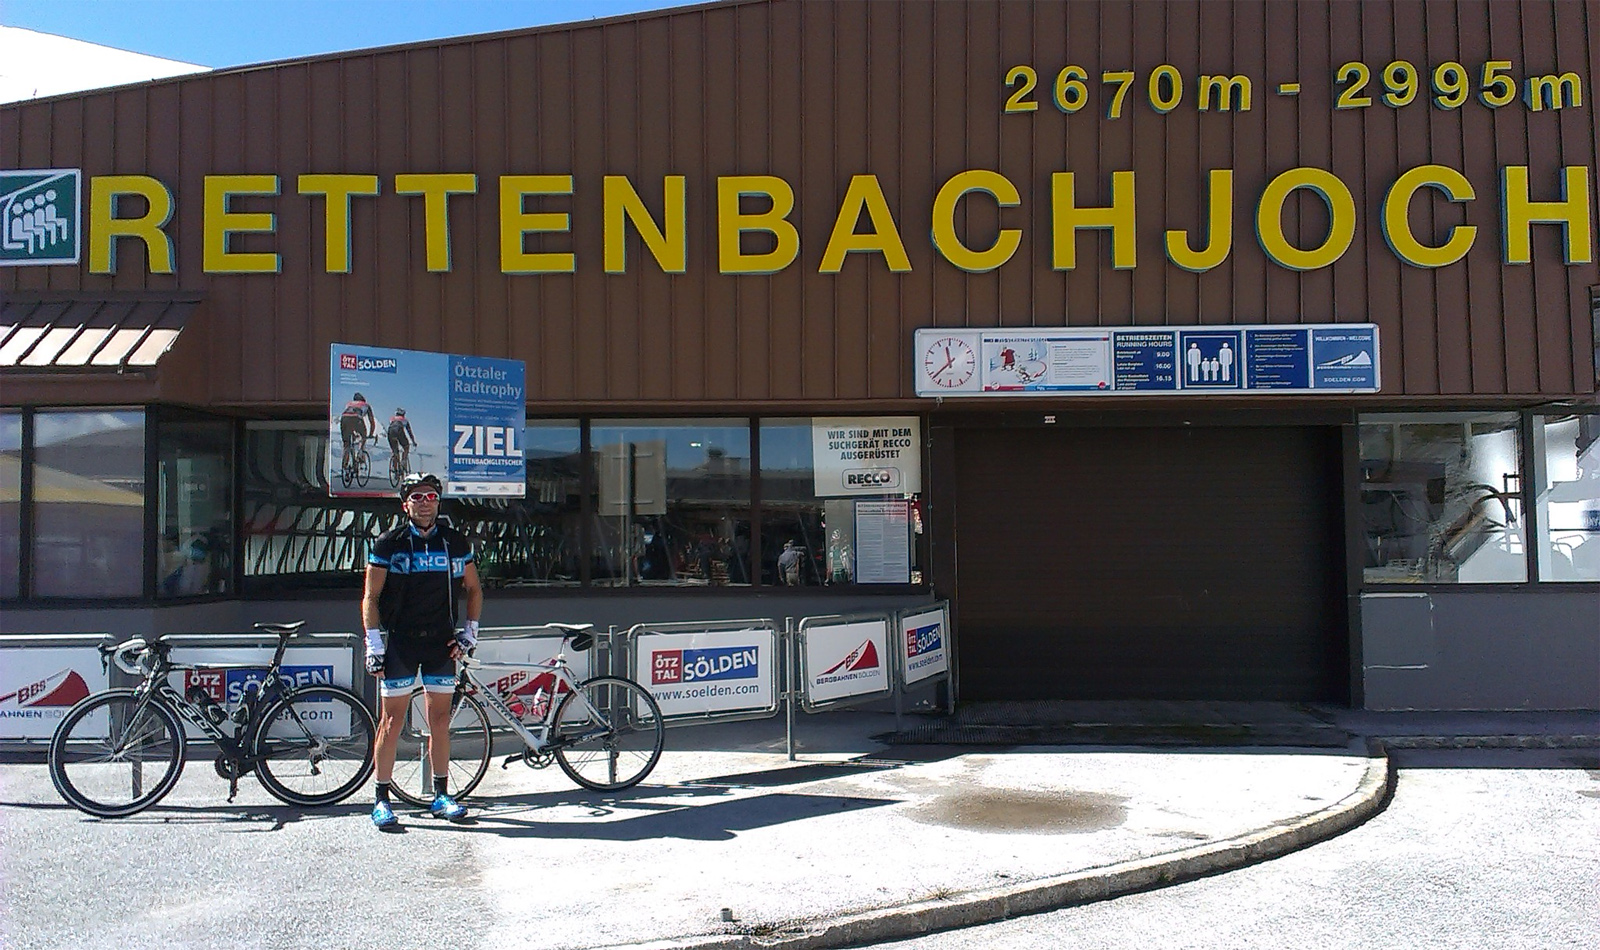 Tiefenbachferner